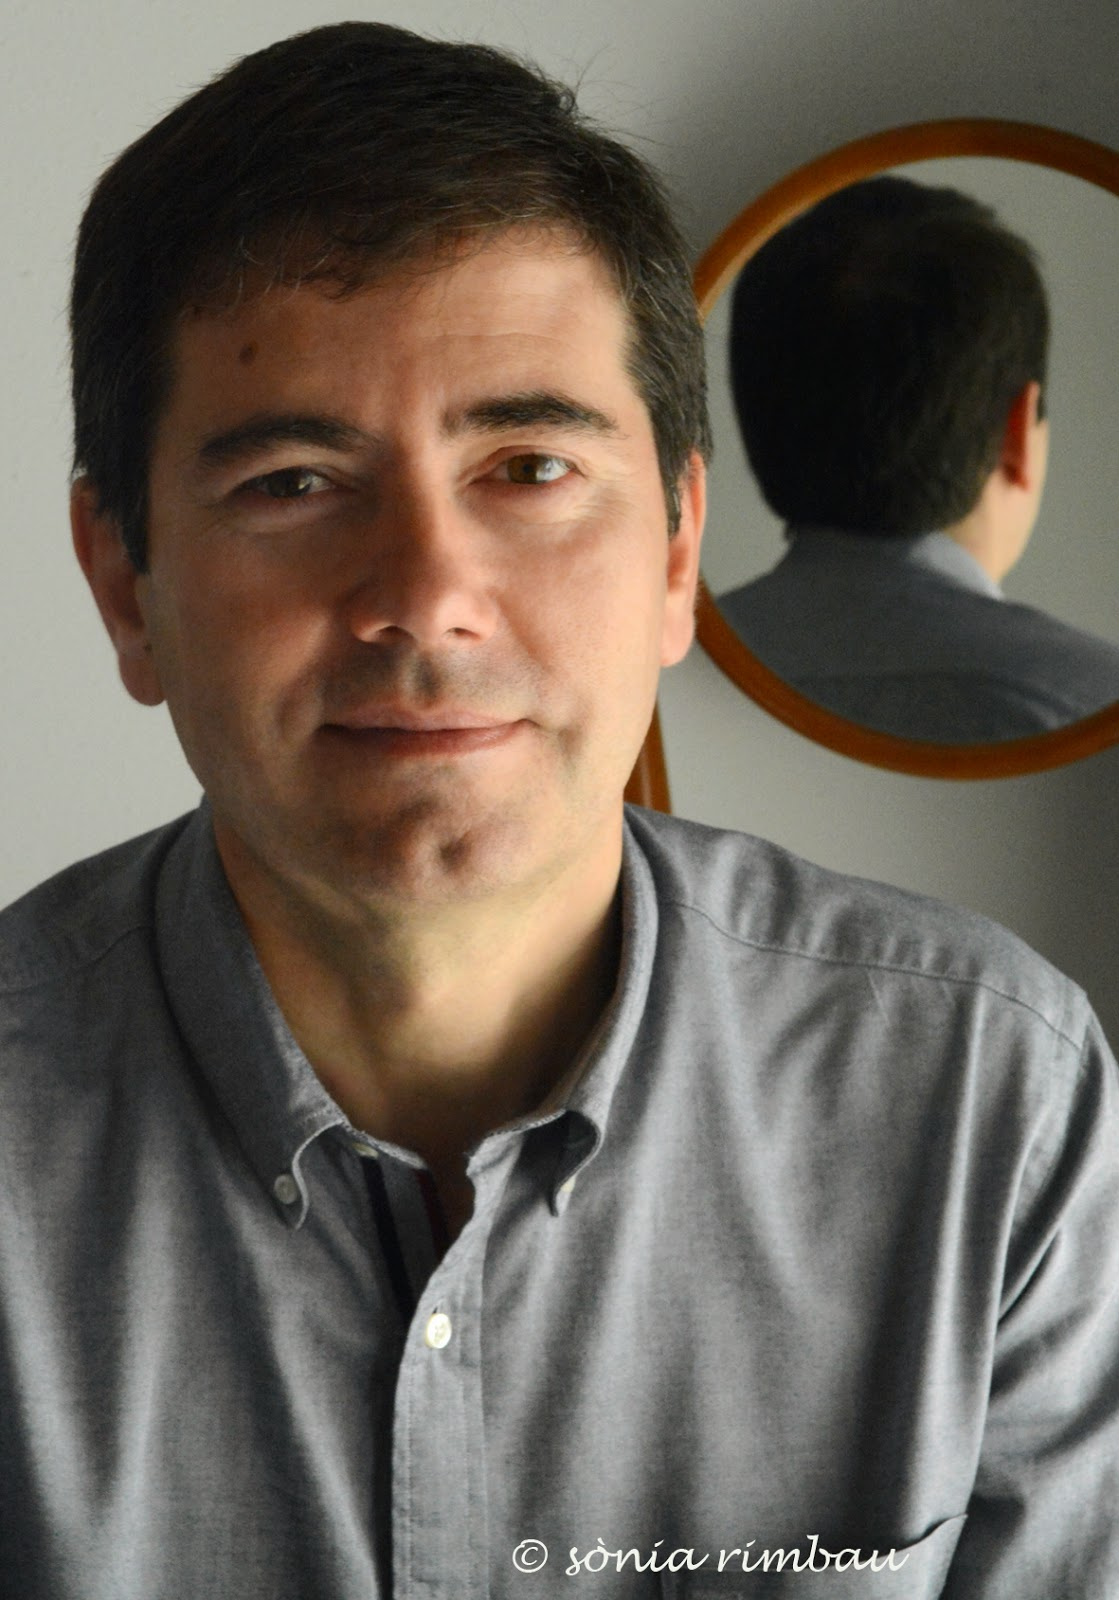 Enrique Villagrasa, Ancile